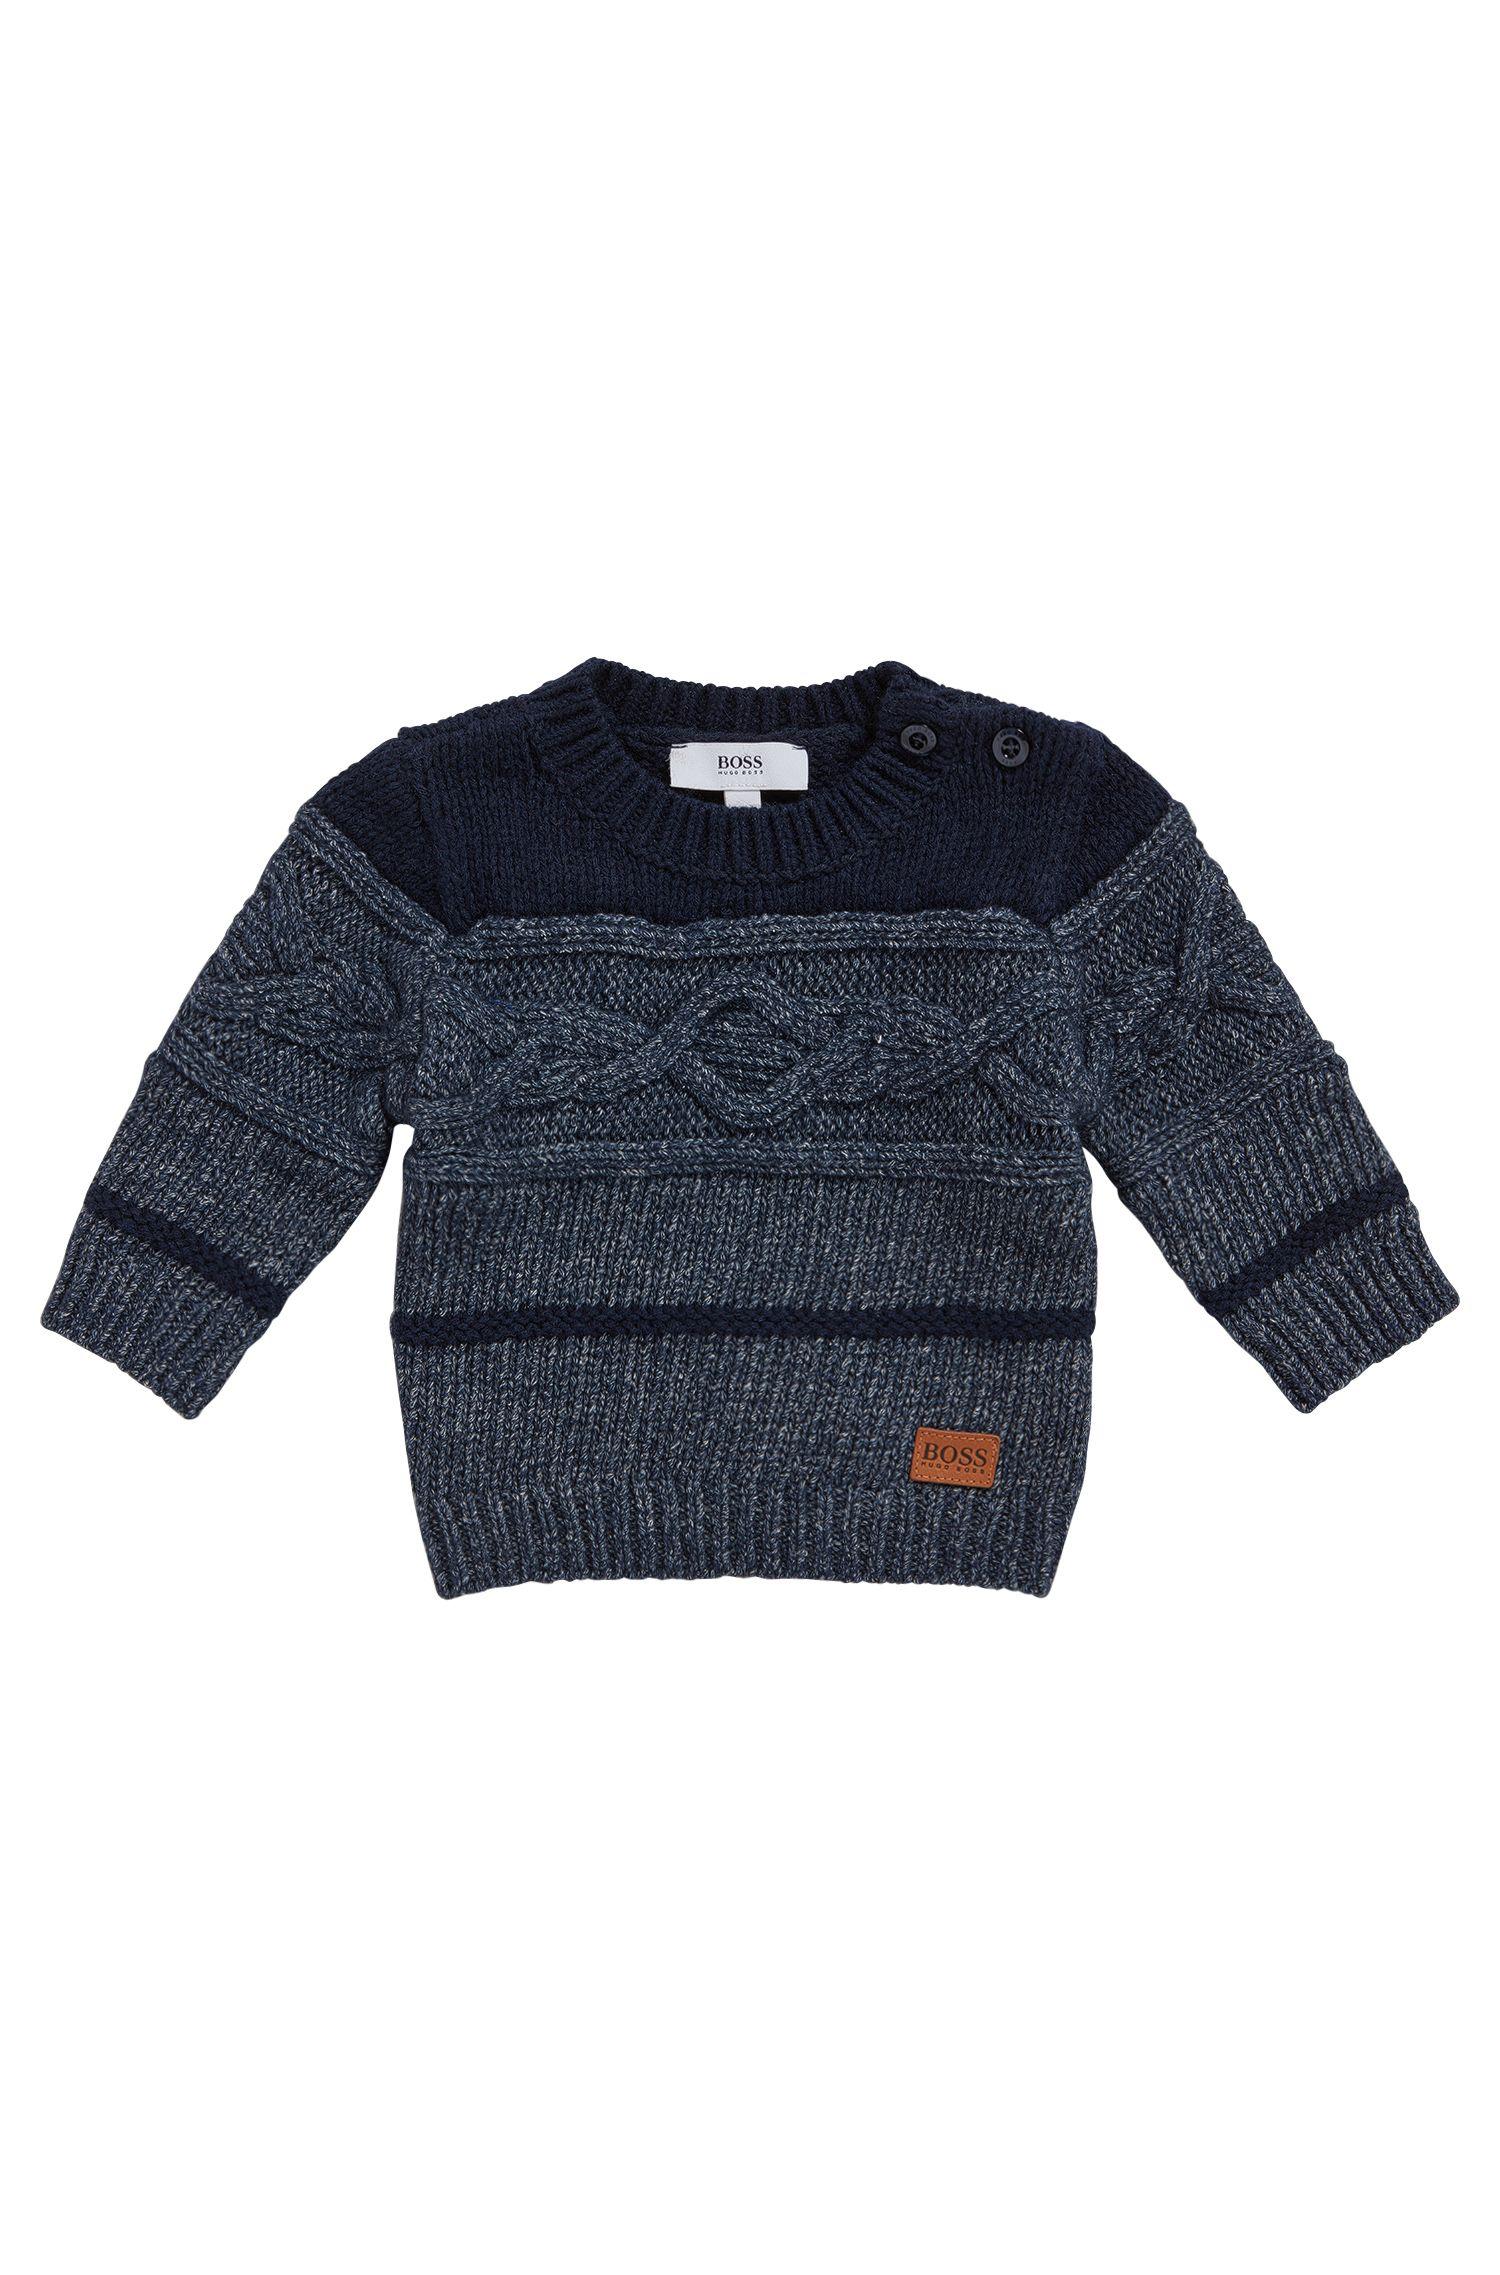 'J05516' | Toddler Stretch Cotton Blend Patterned Sweater